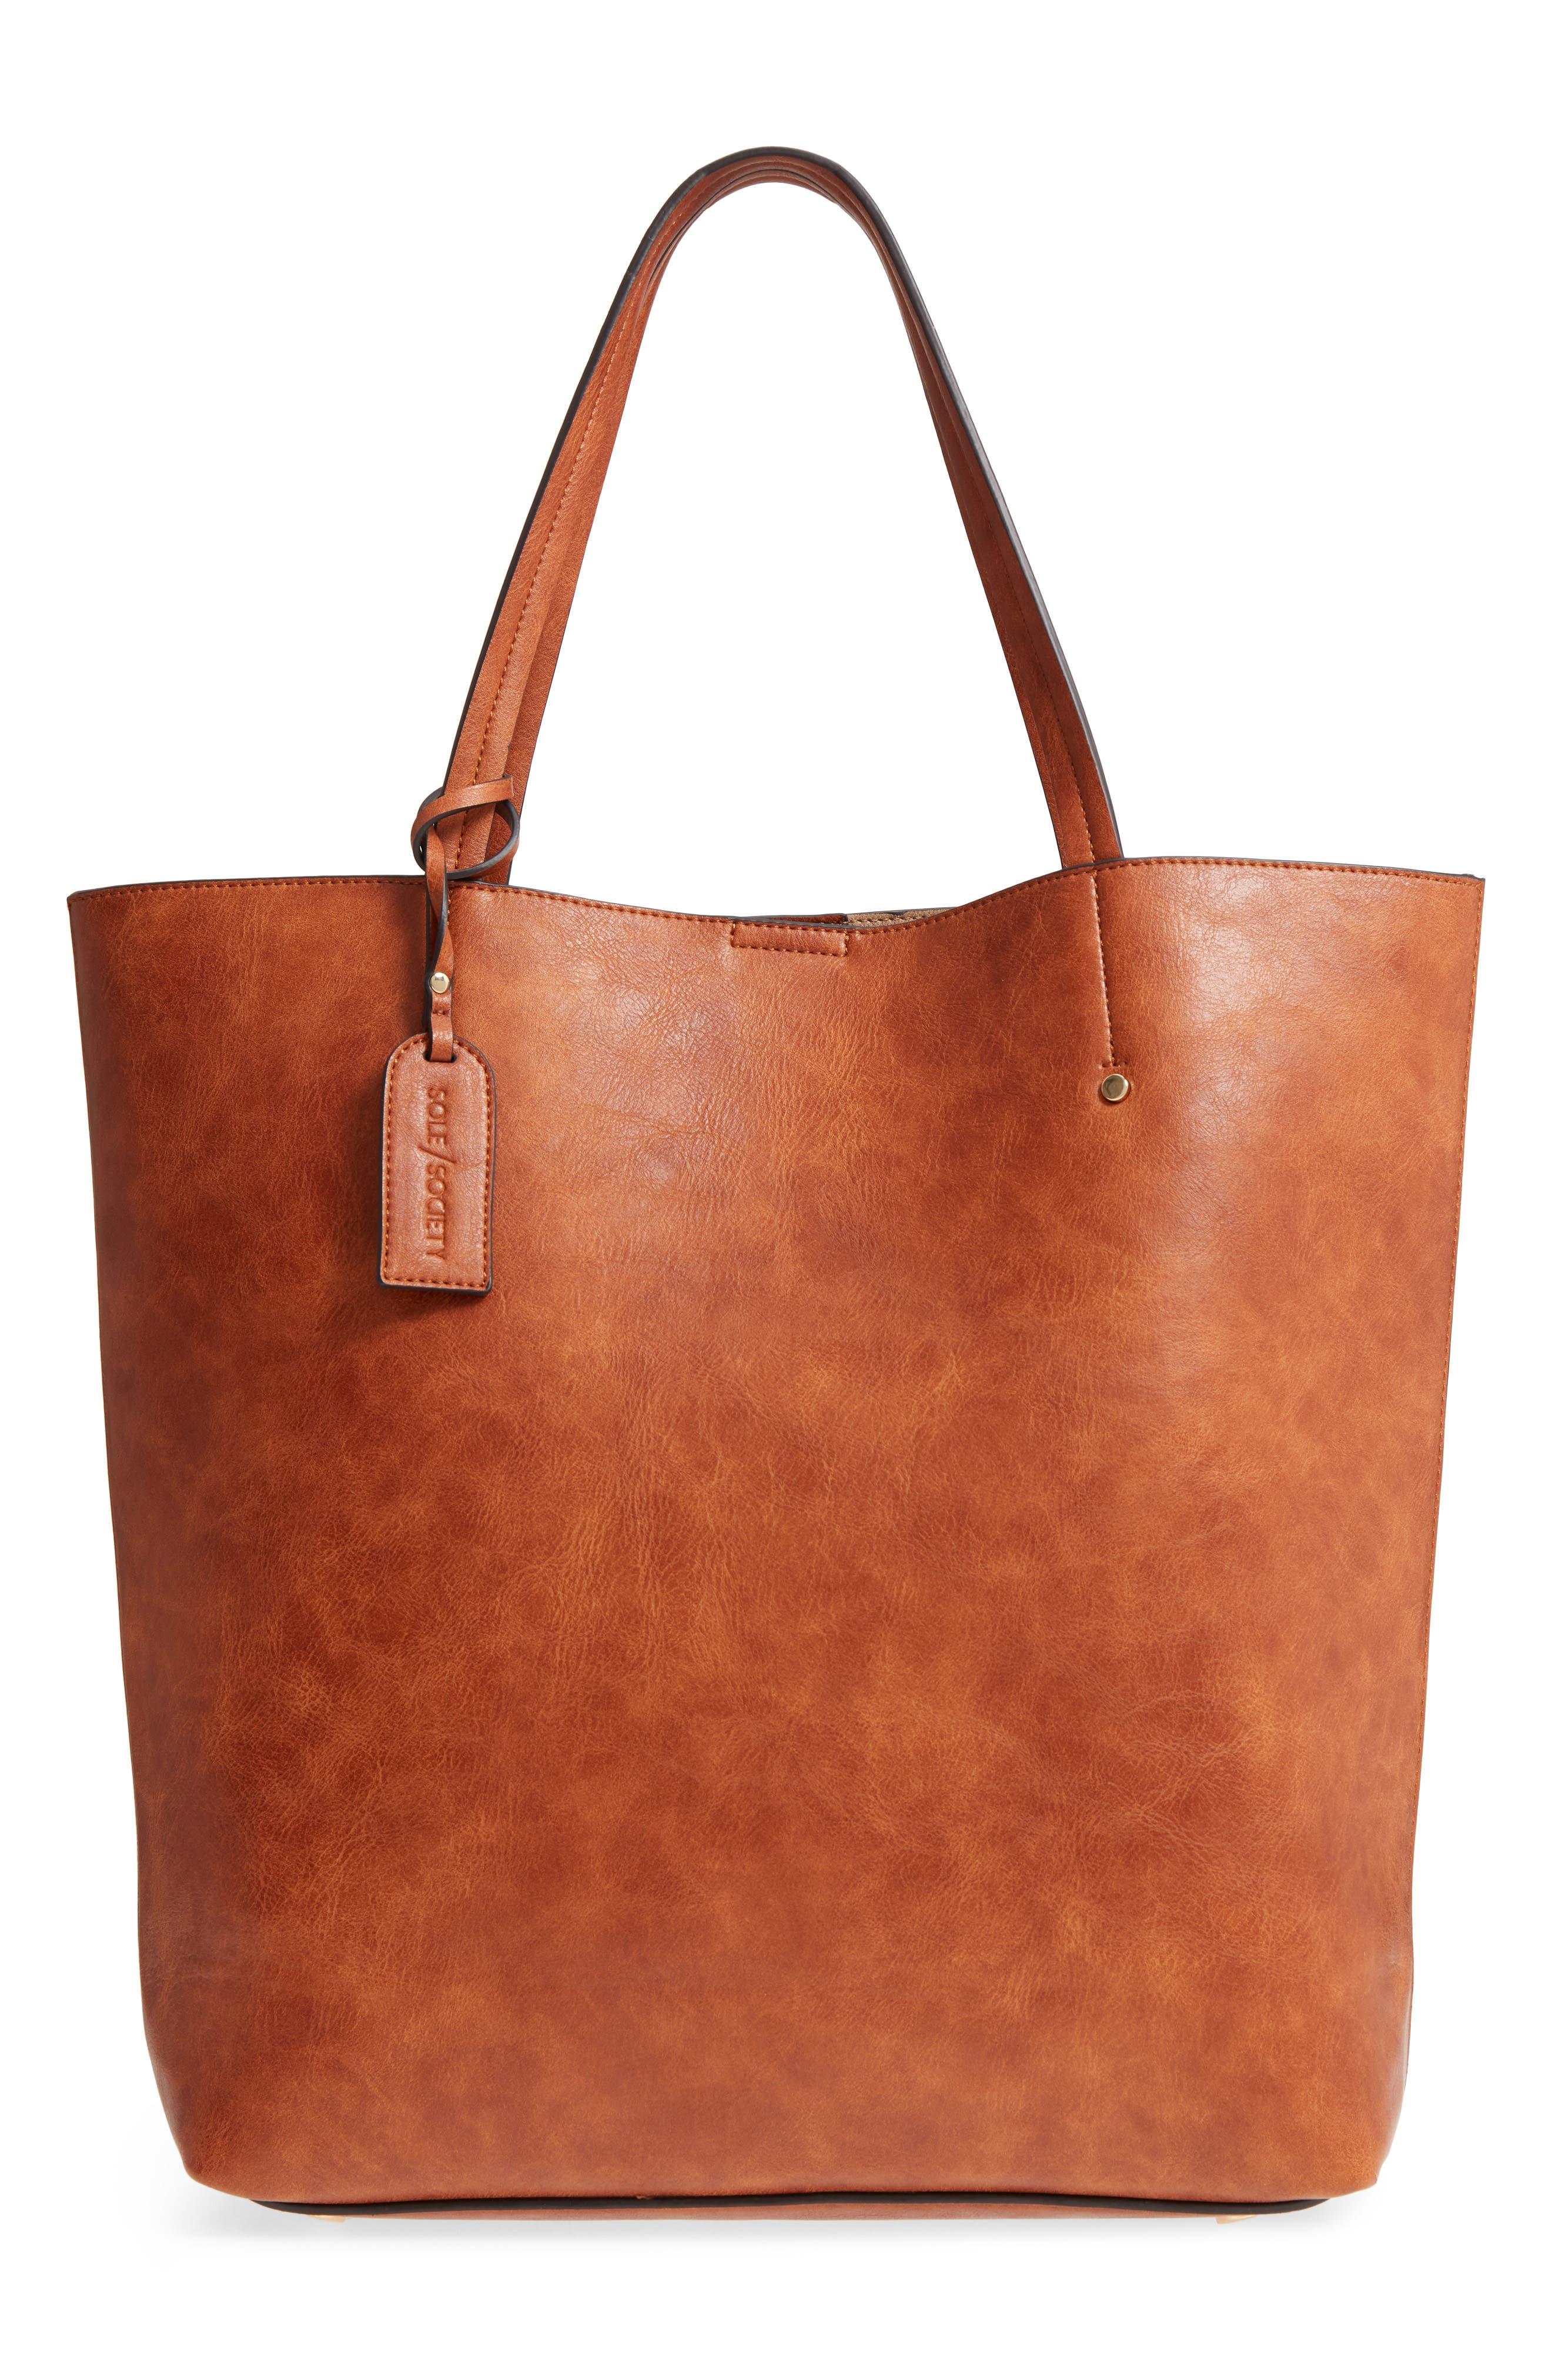 Nuddo Faux Leather Tote,                         Main,                         color, COGNAC